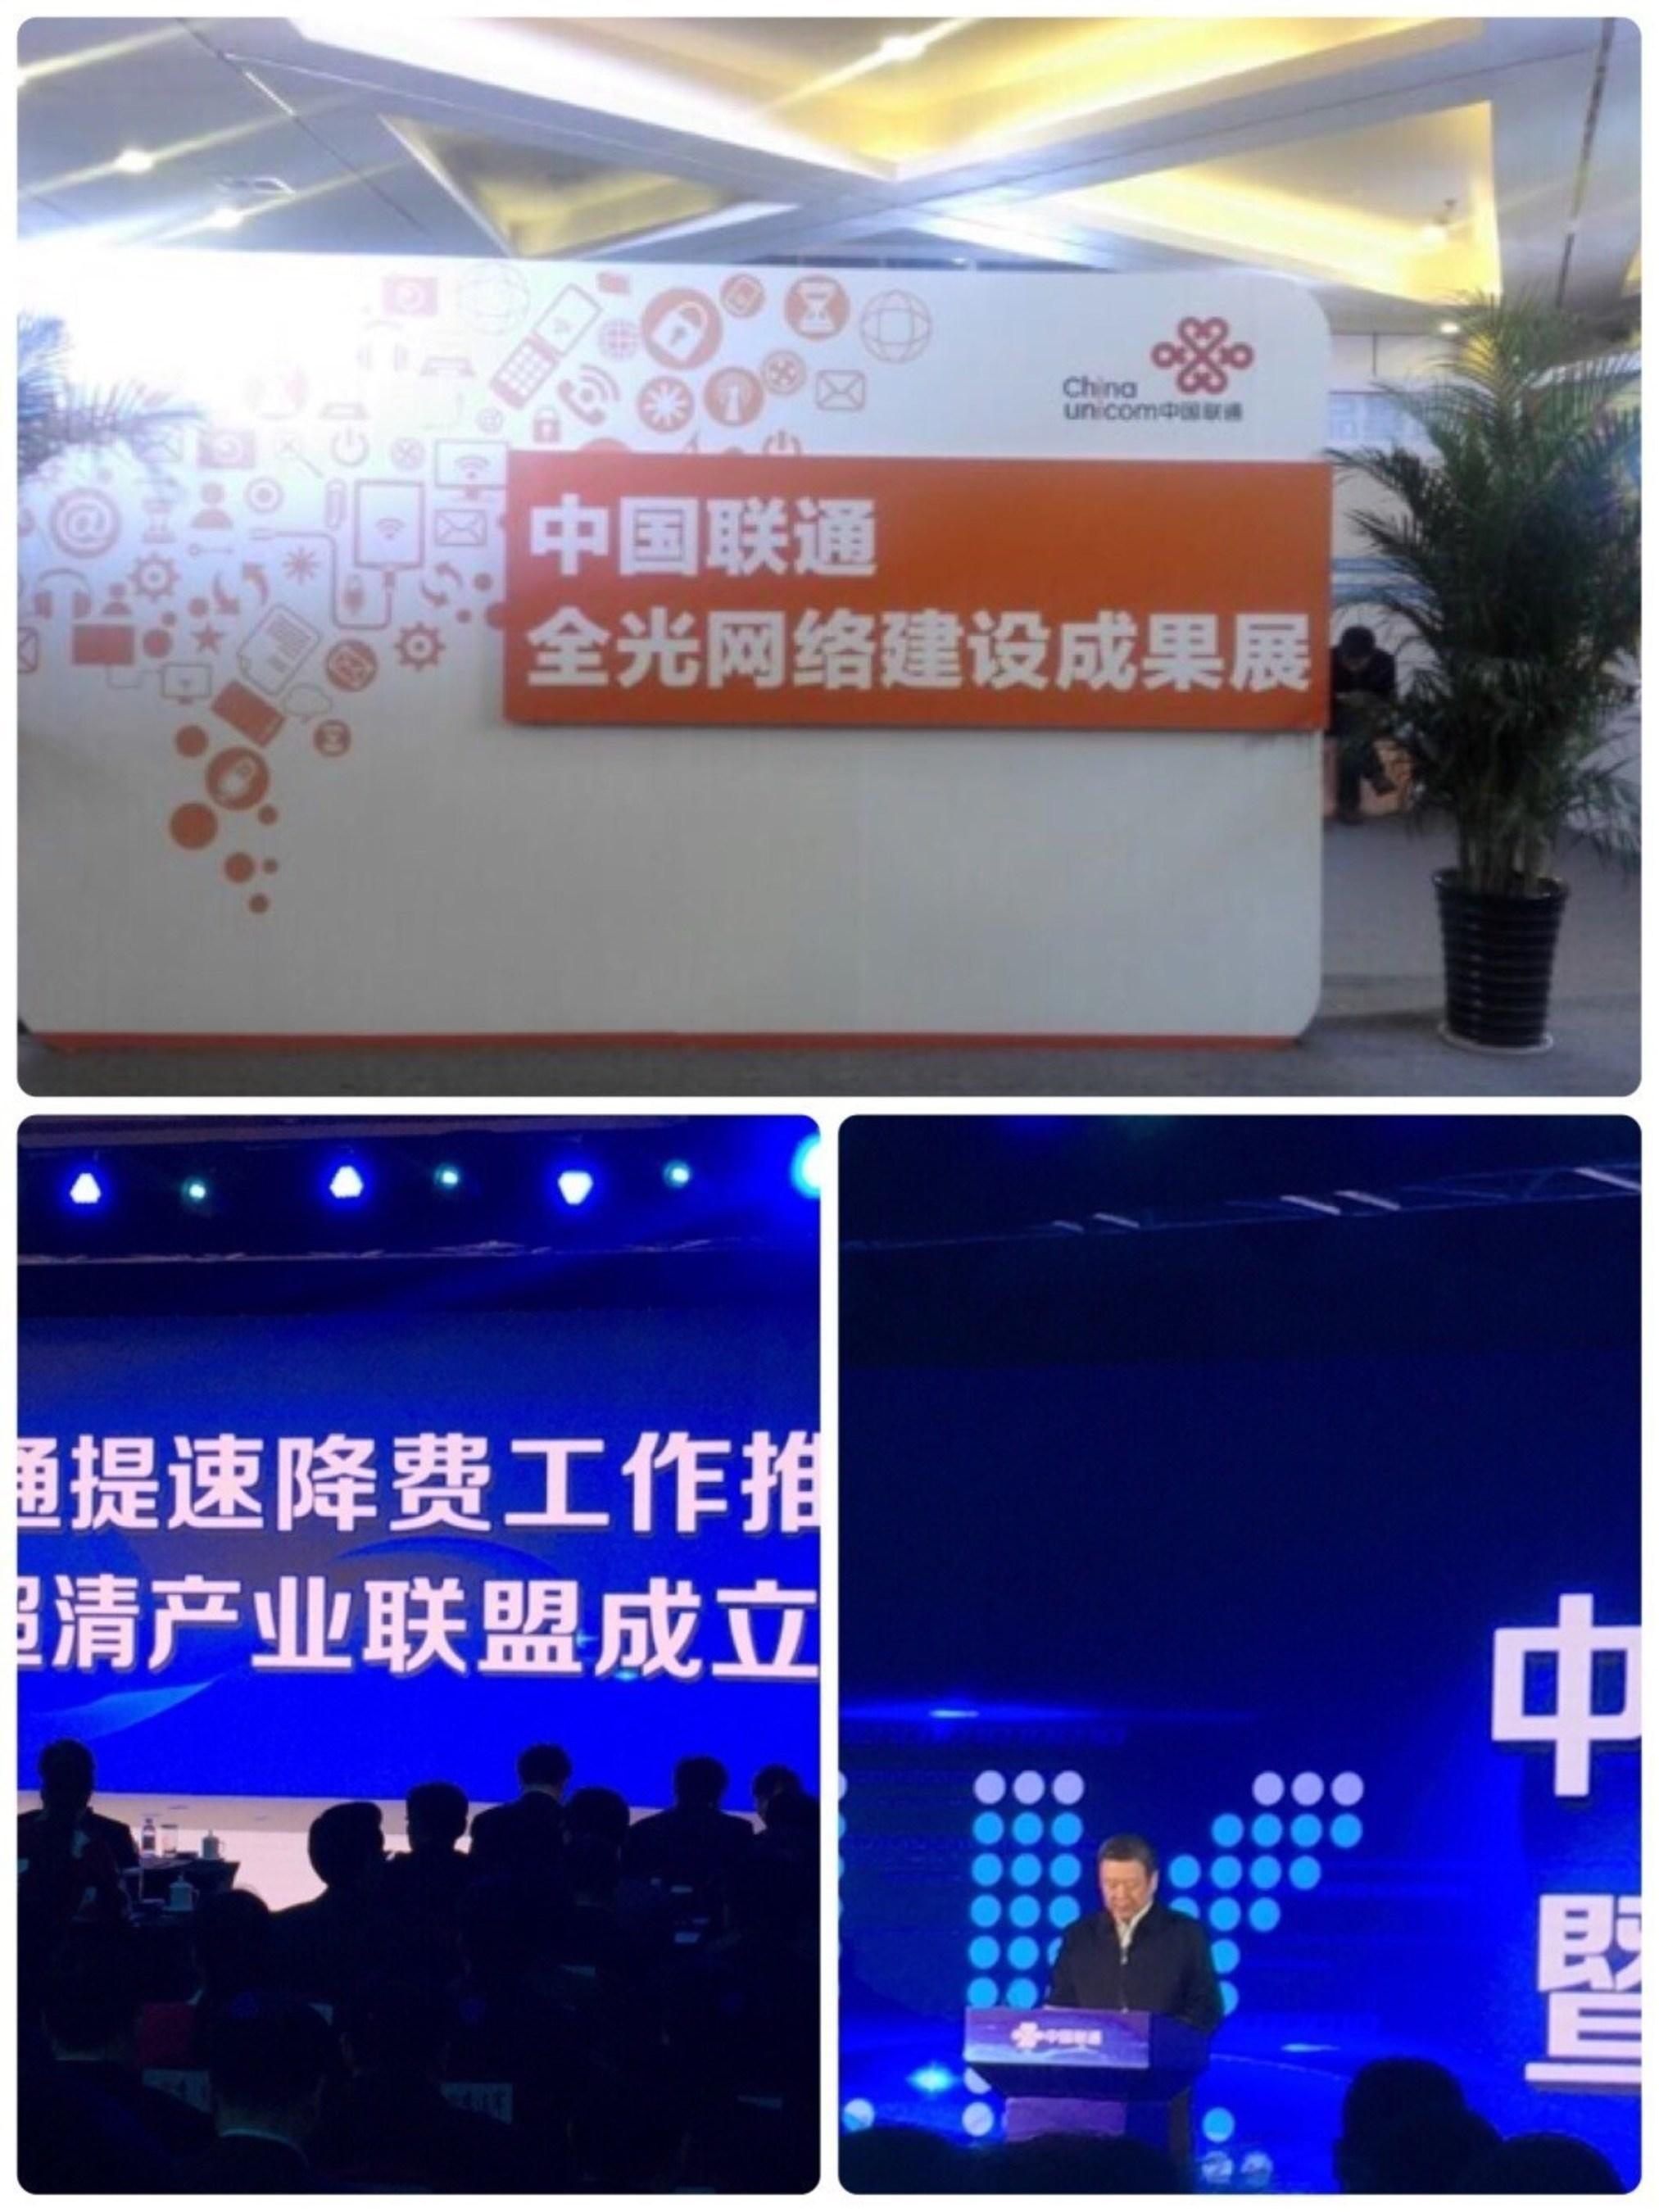 Ubitus and China Unicom Showcase the World's First 4K Cloud Game Streaming